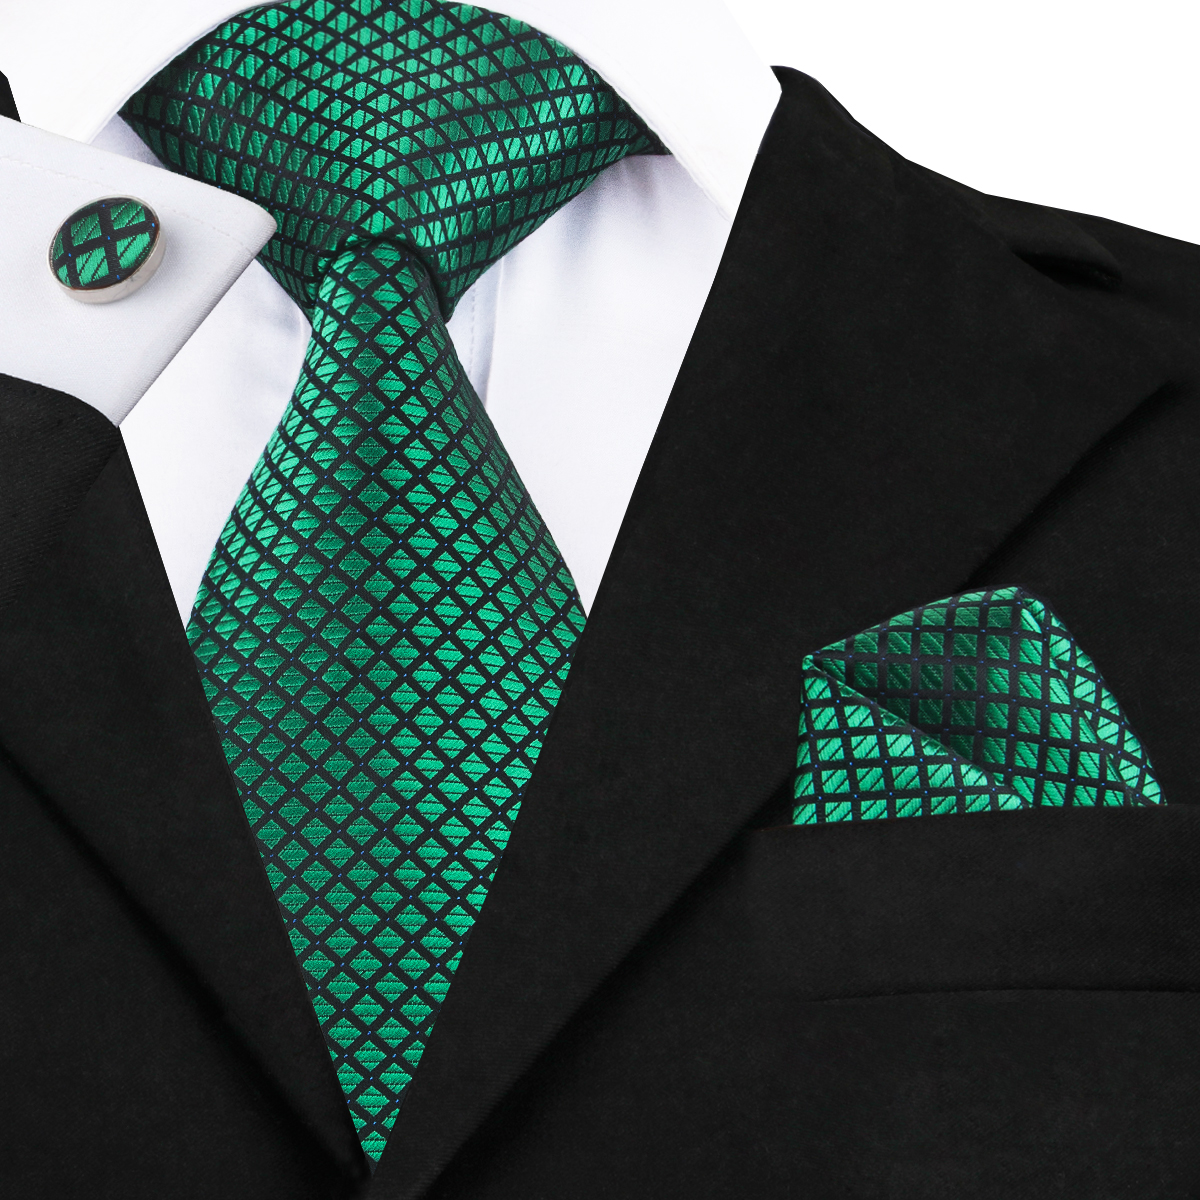 SN-1608 oi-tie nova xadrez verde gravata hanky abotoaduras definir moda dos homens de alta qualidade seda jacquard gravatas corbatas dos homens